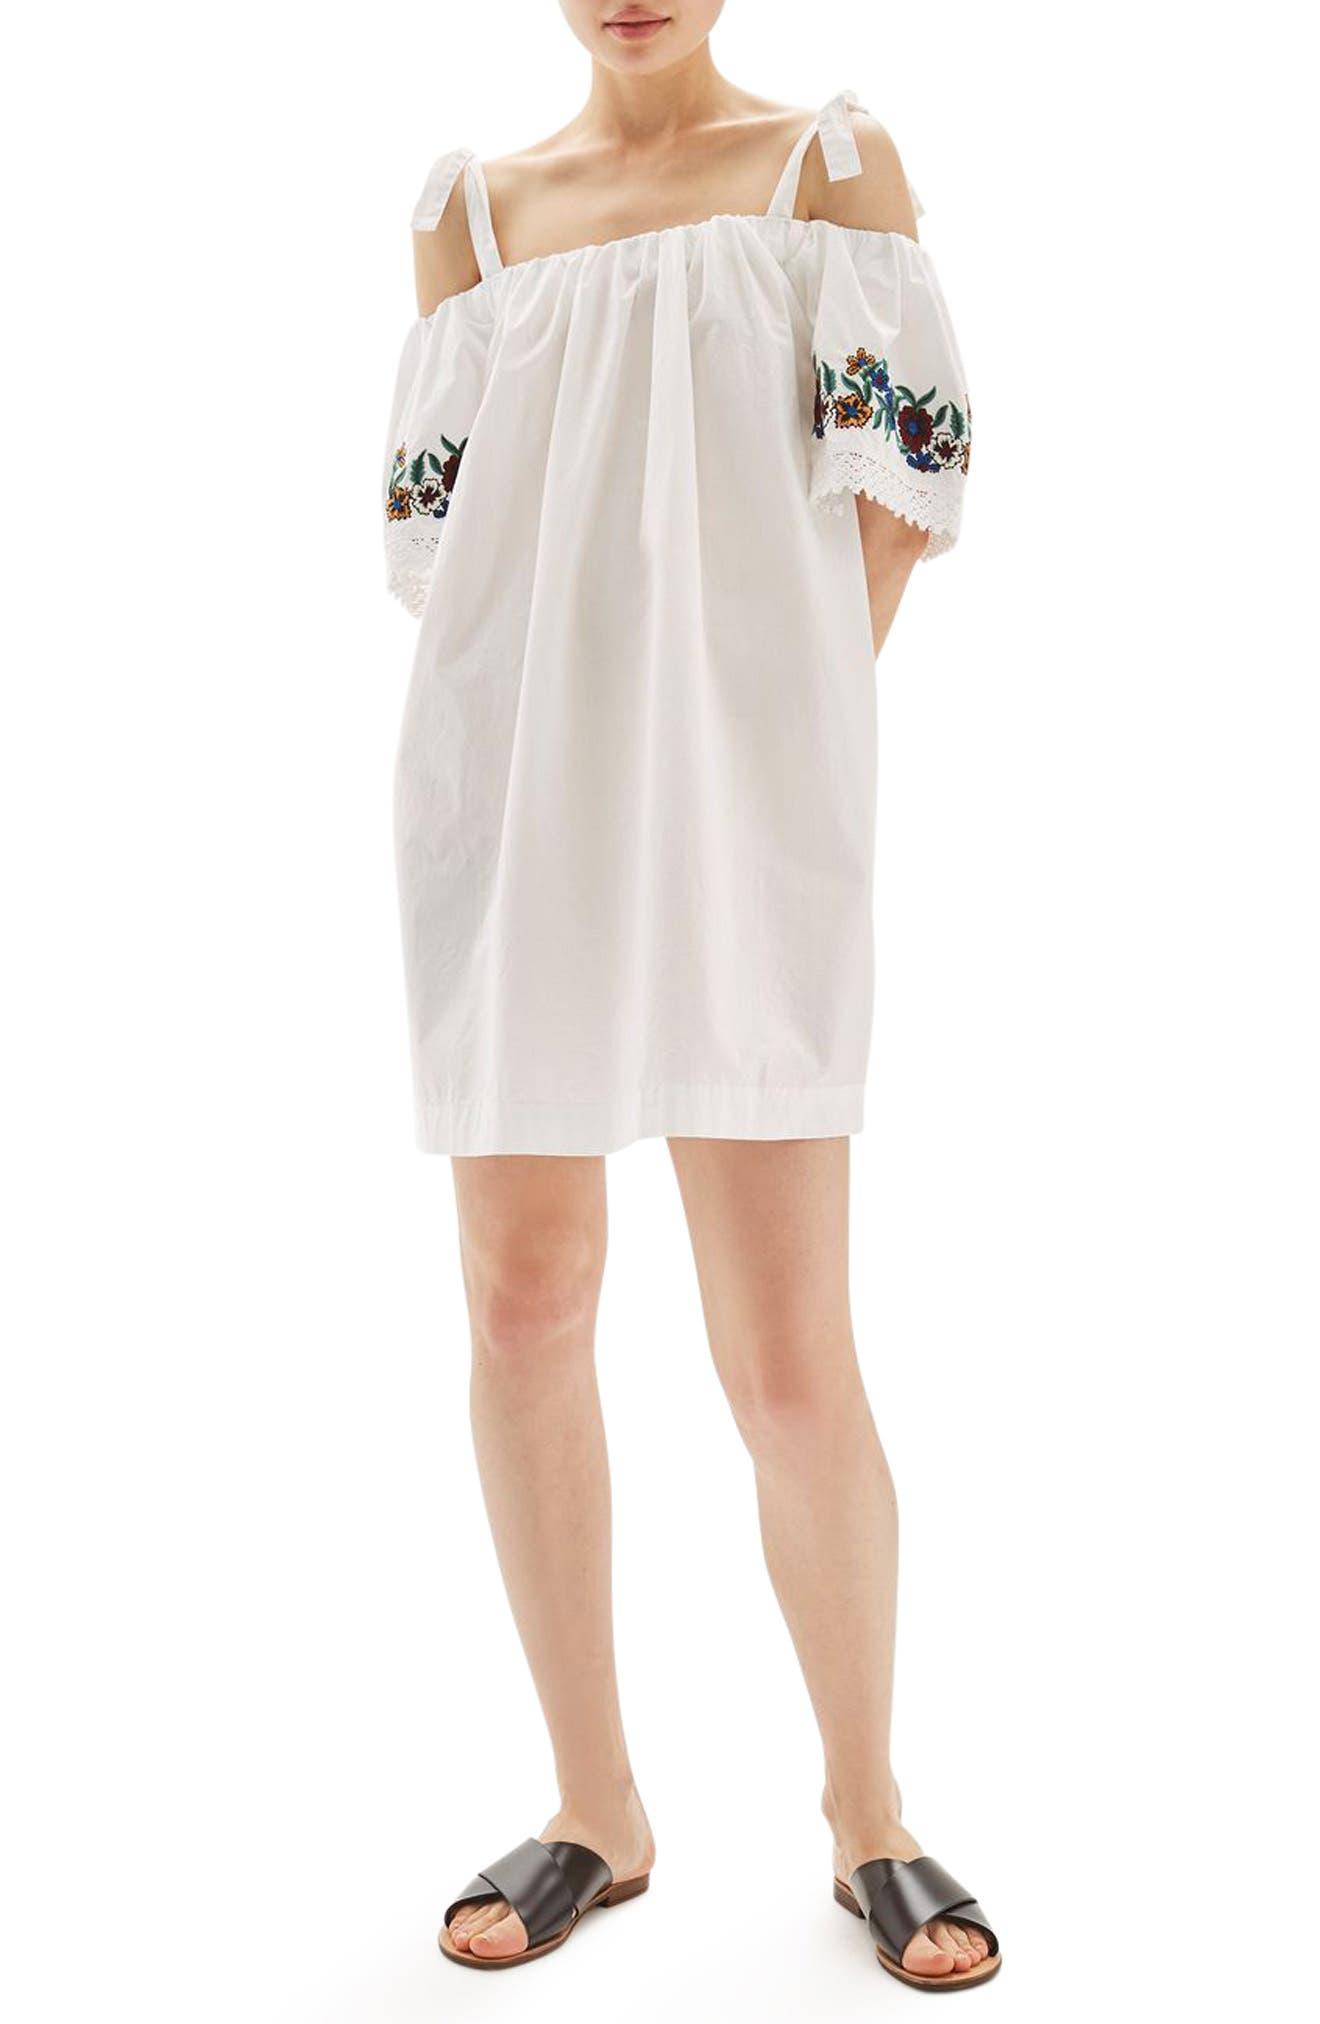 Main Image - Topshop Bardot Embroidered Dress